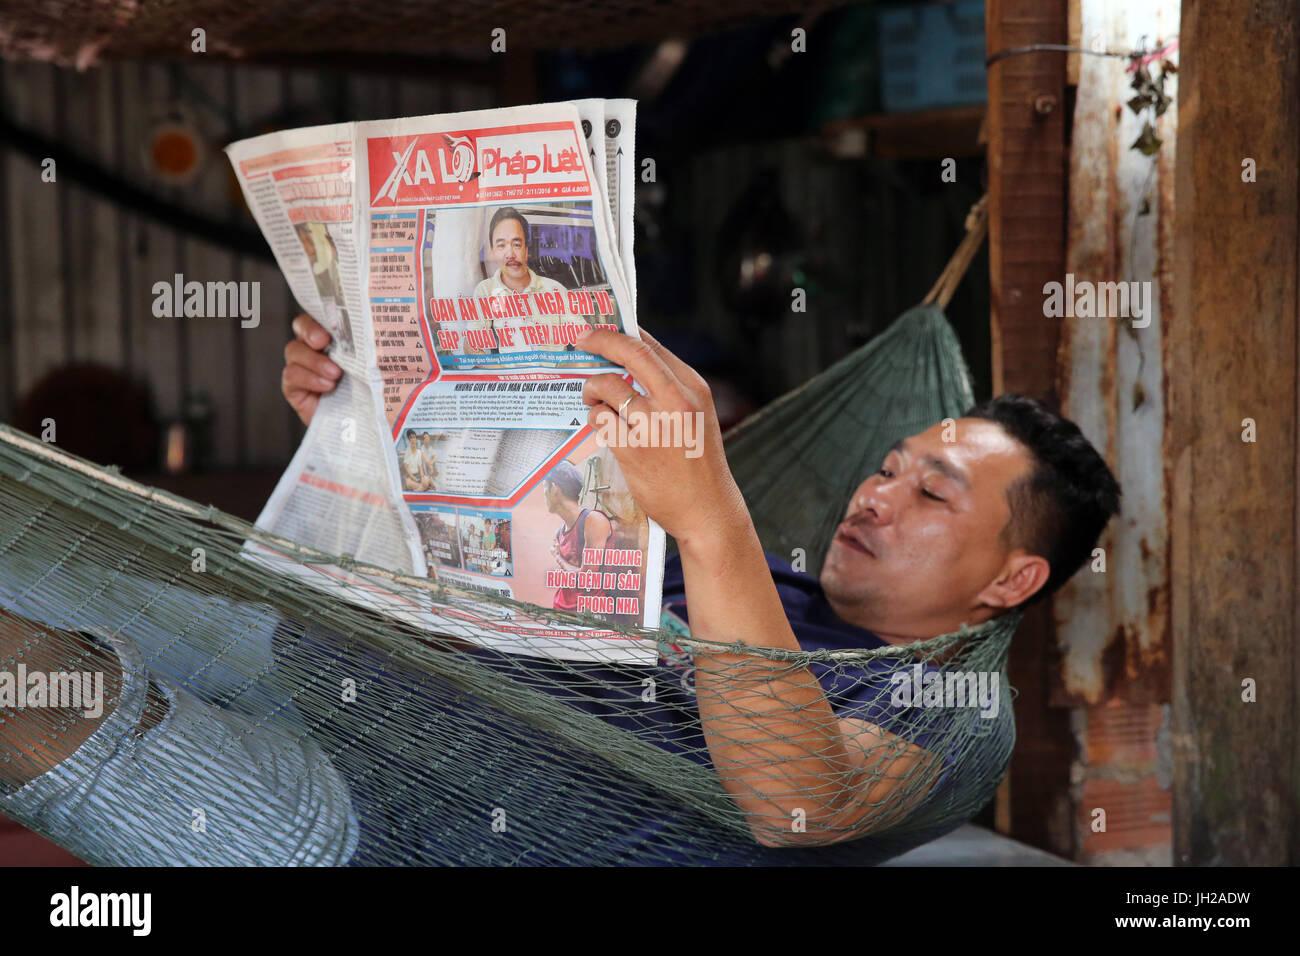 Man reading newspaper in a Hammock.  Vietnam. - Stock Image